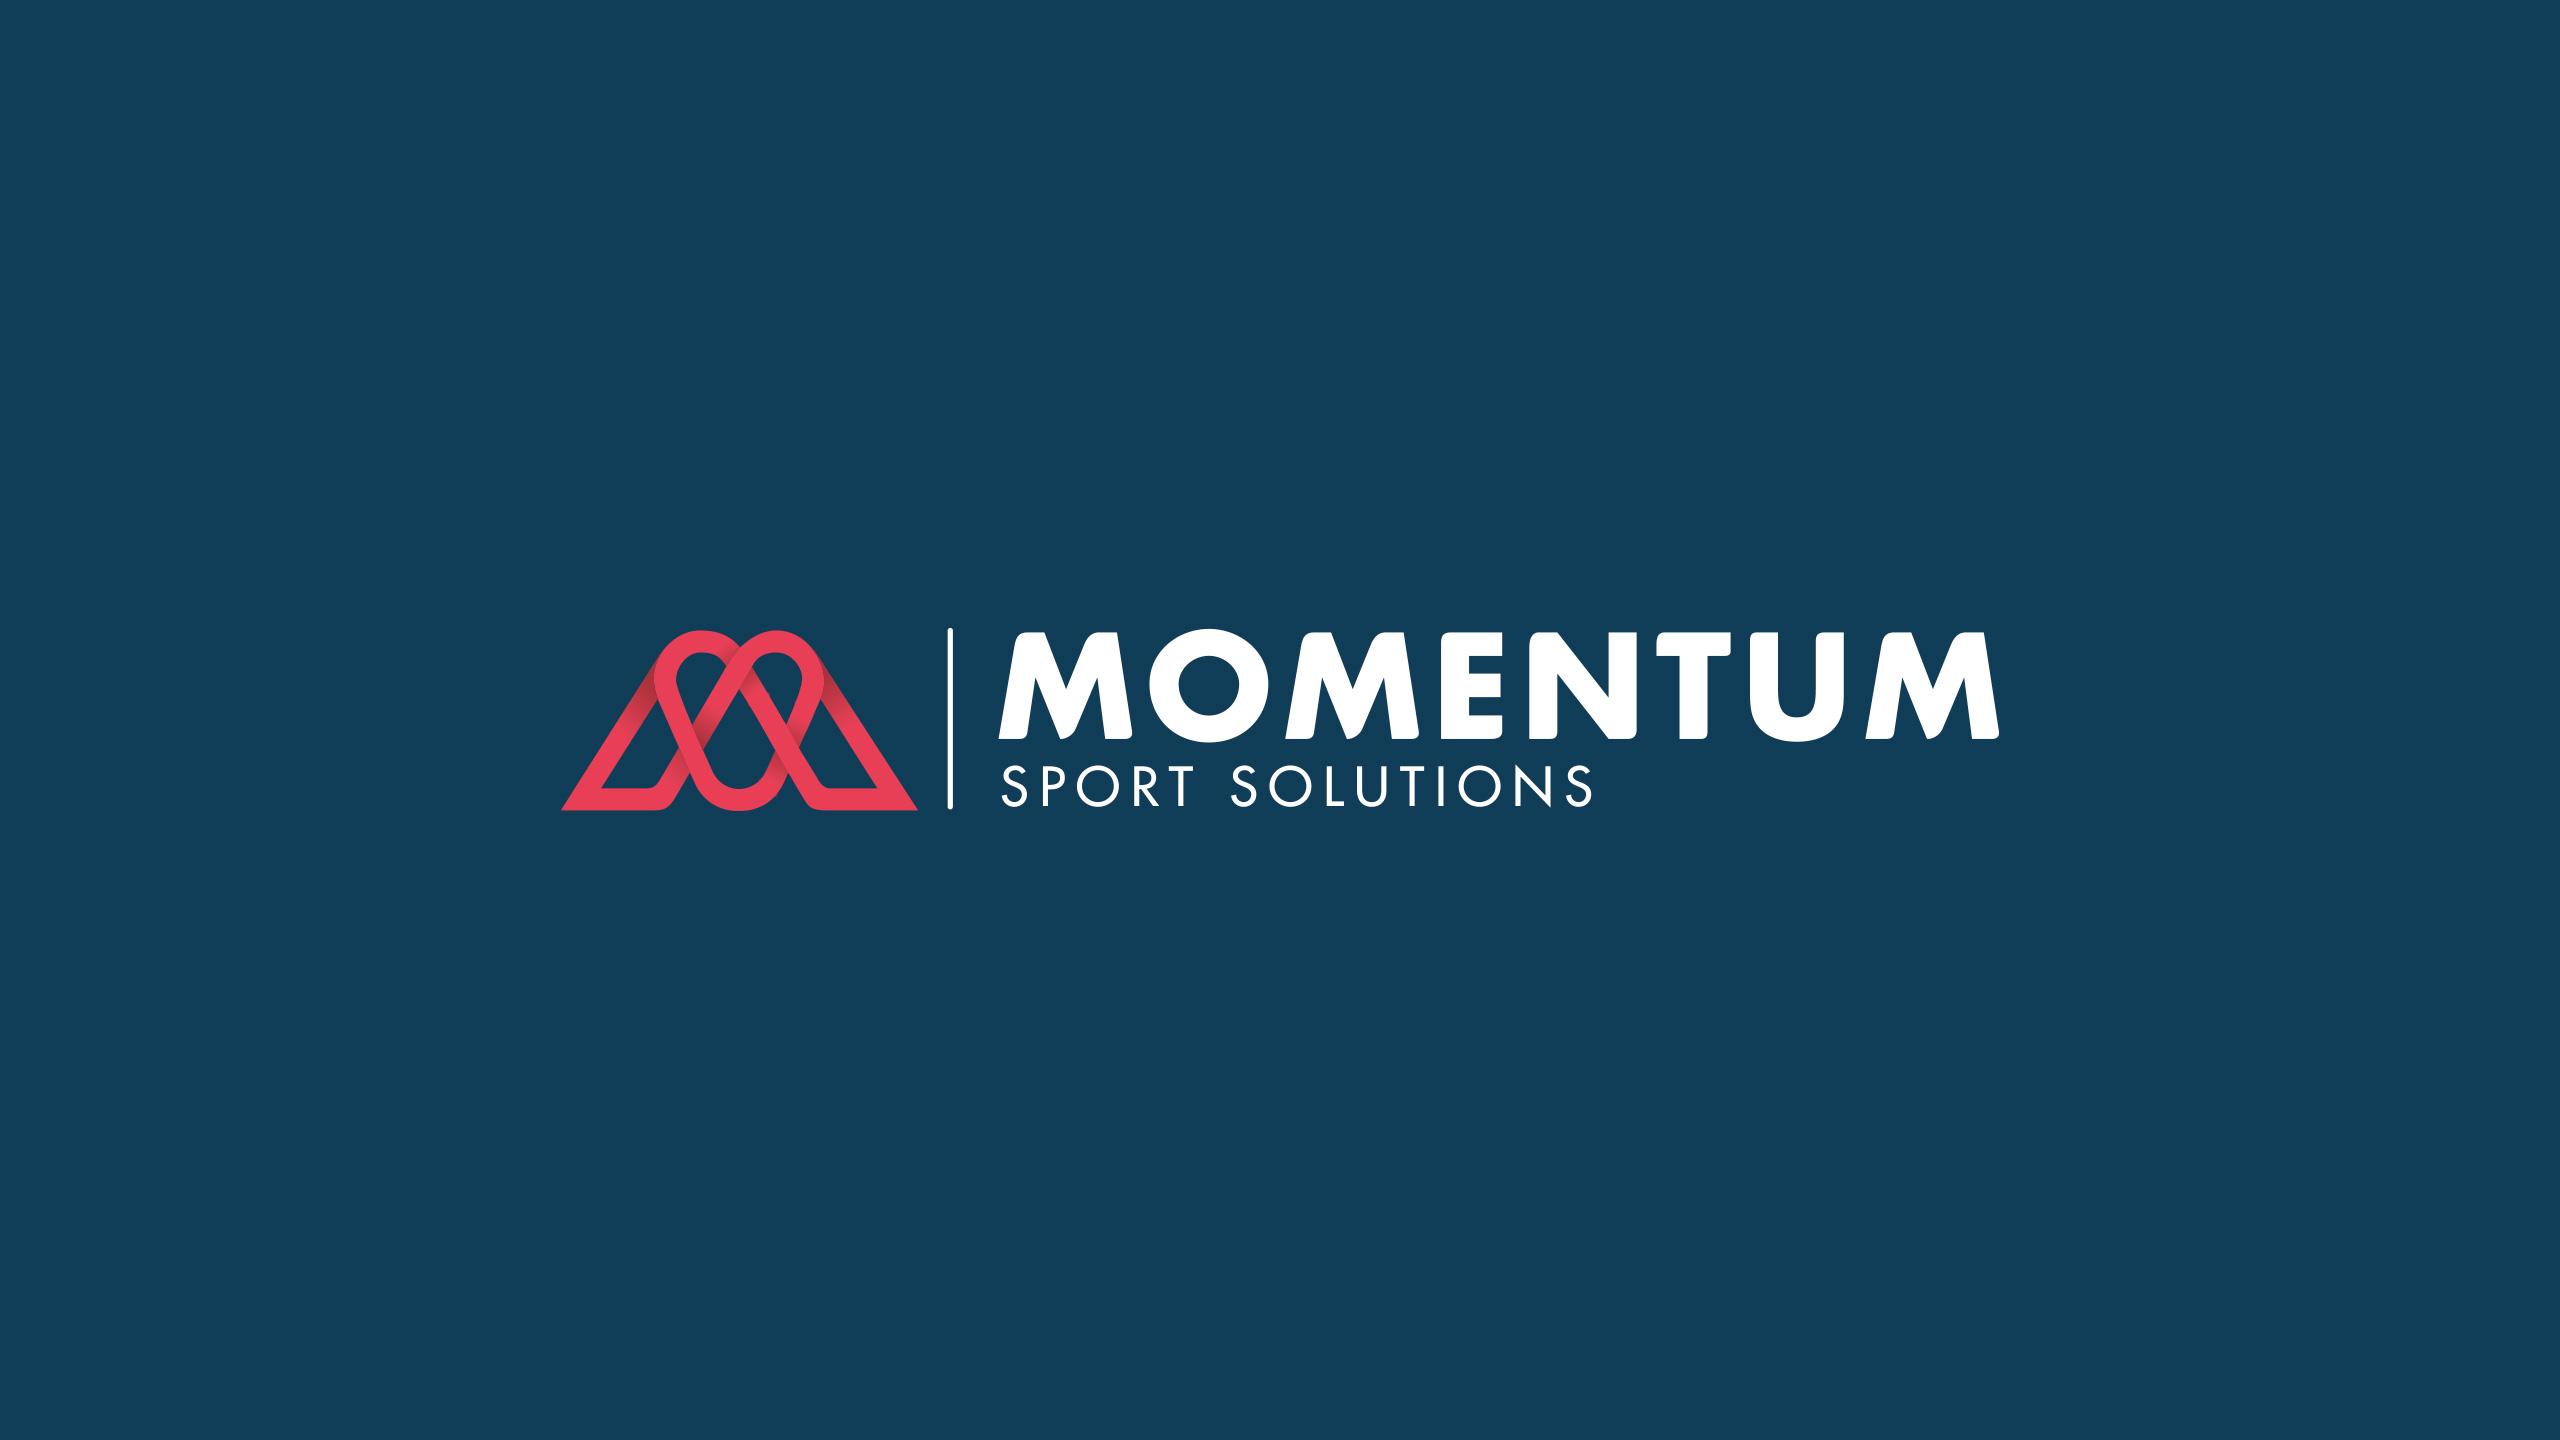 kamikaze_momentum_identidad_08